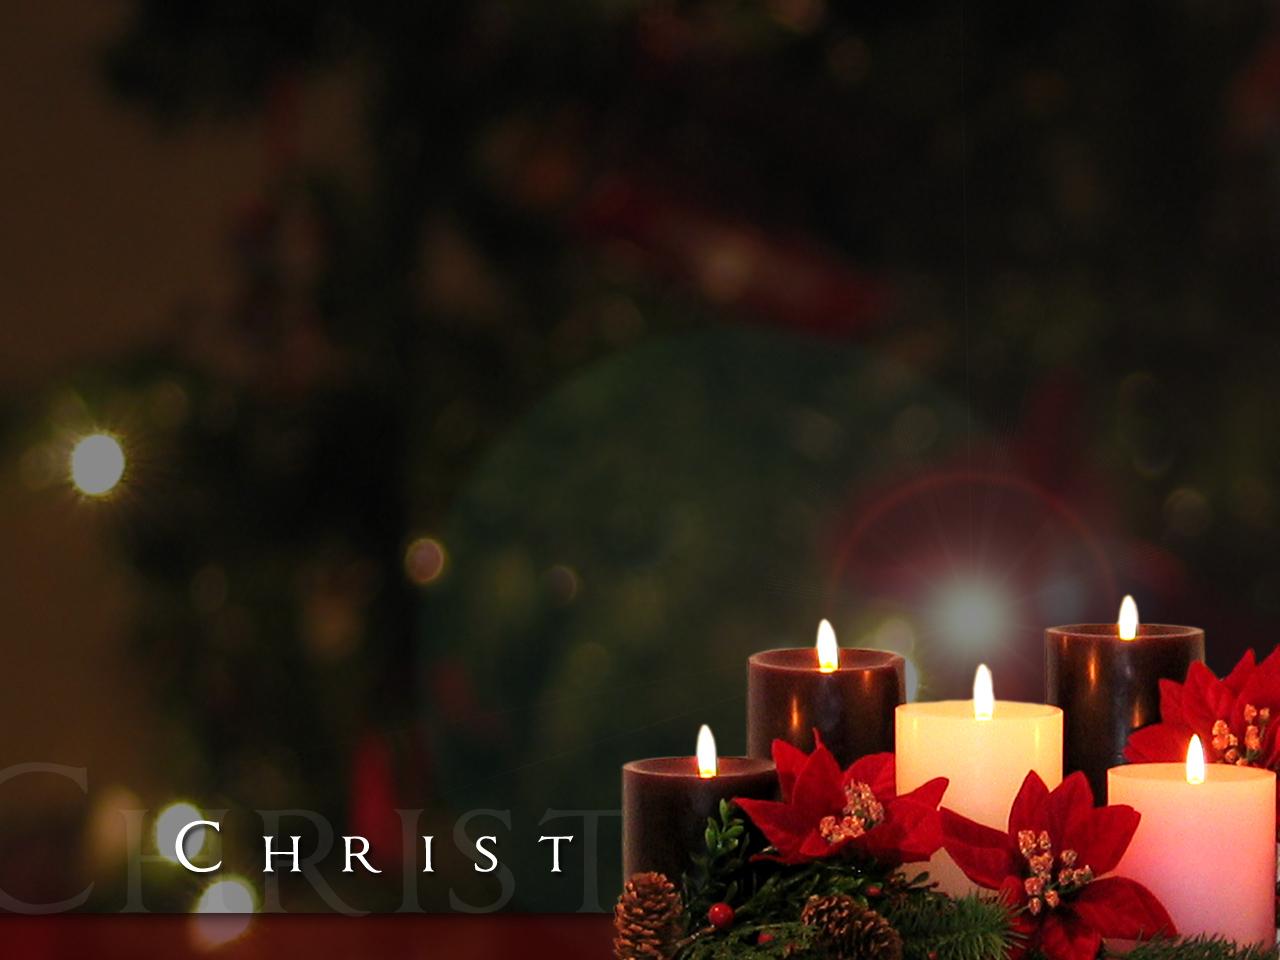 christ the light screensaver - photo #14